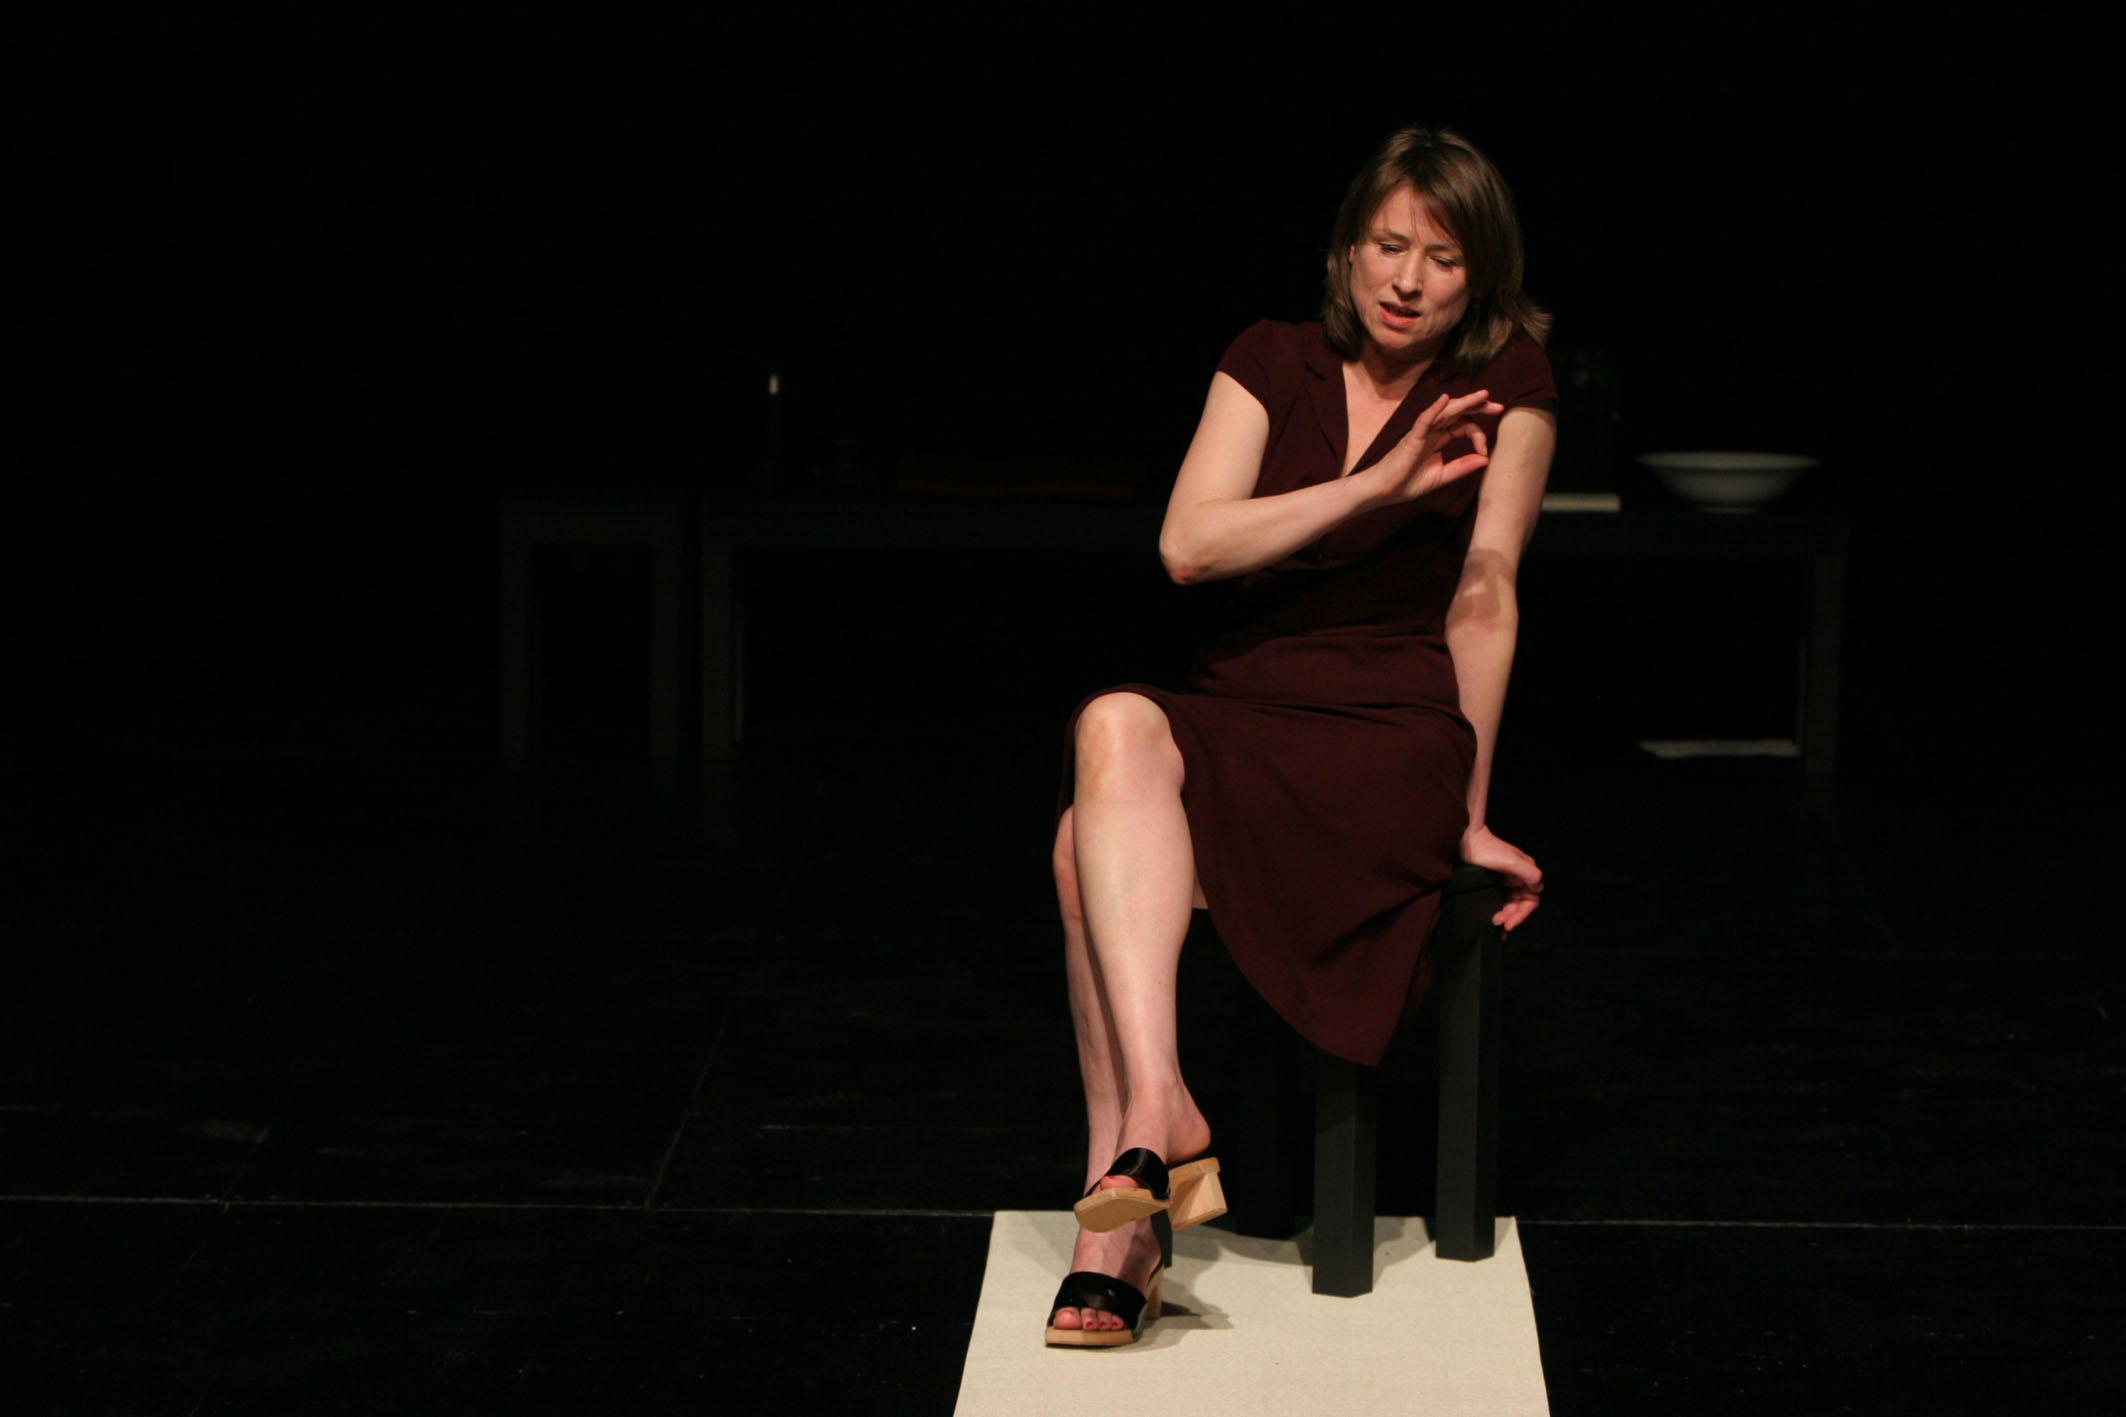 Corinna Harfouch's Feet Mila Kunis Imdb